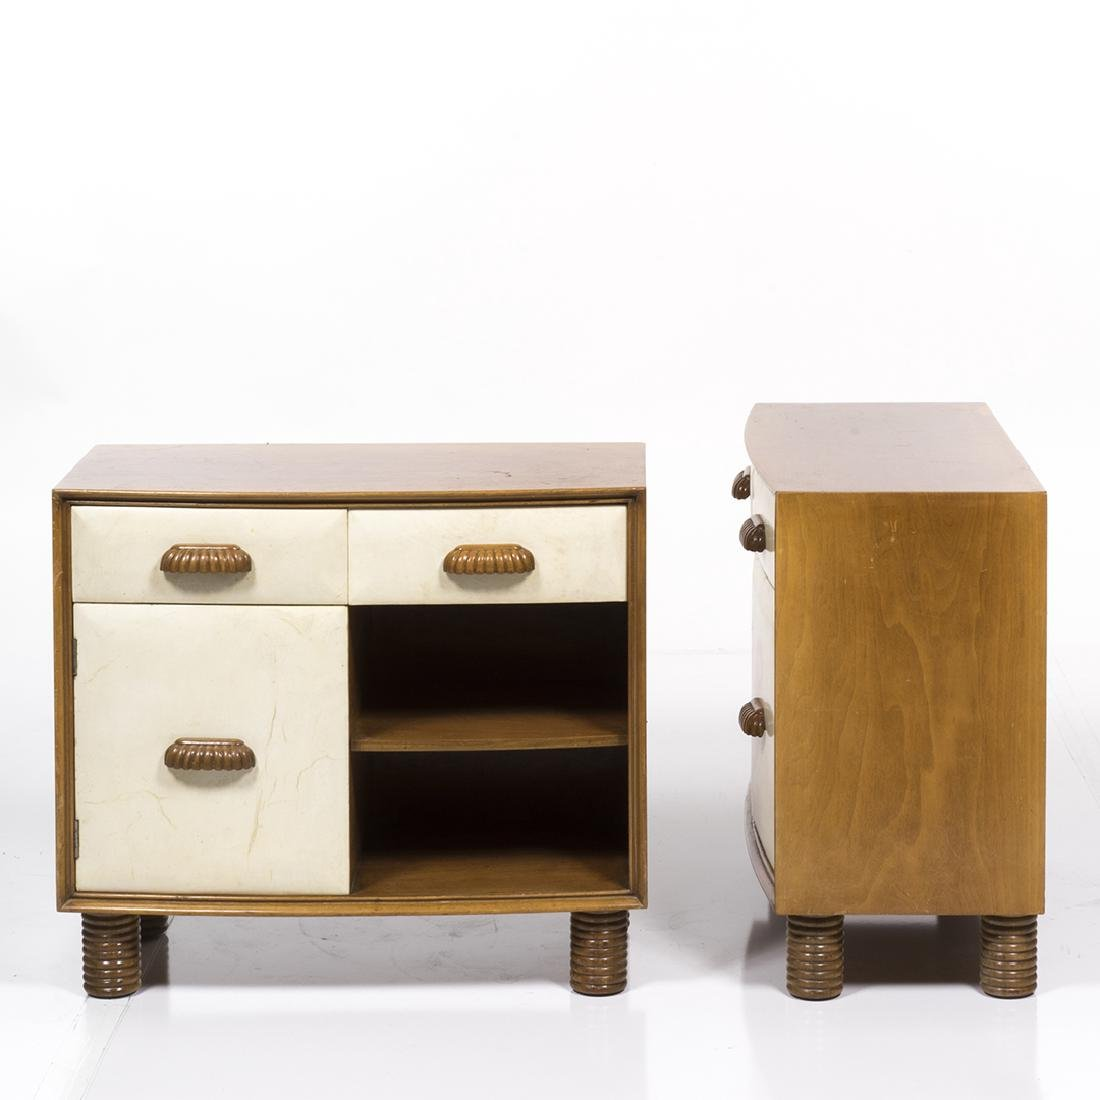 Osvaldo Borsani Bedside Cabinets (2) - 5